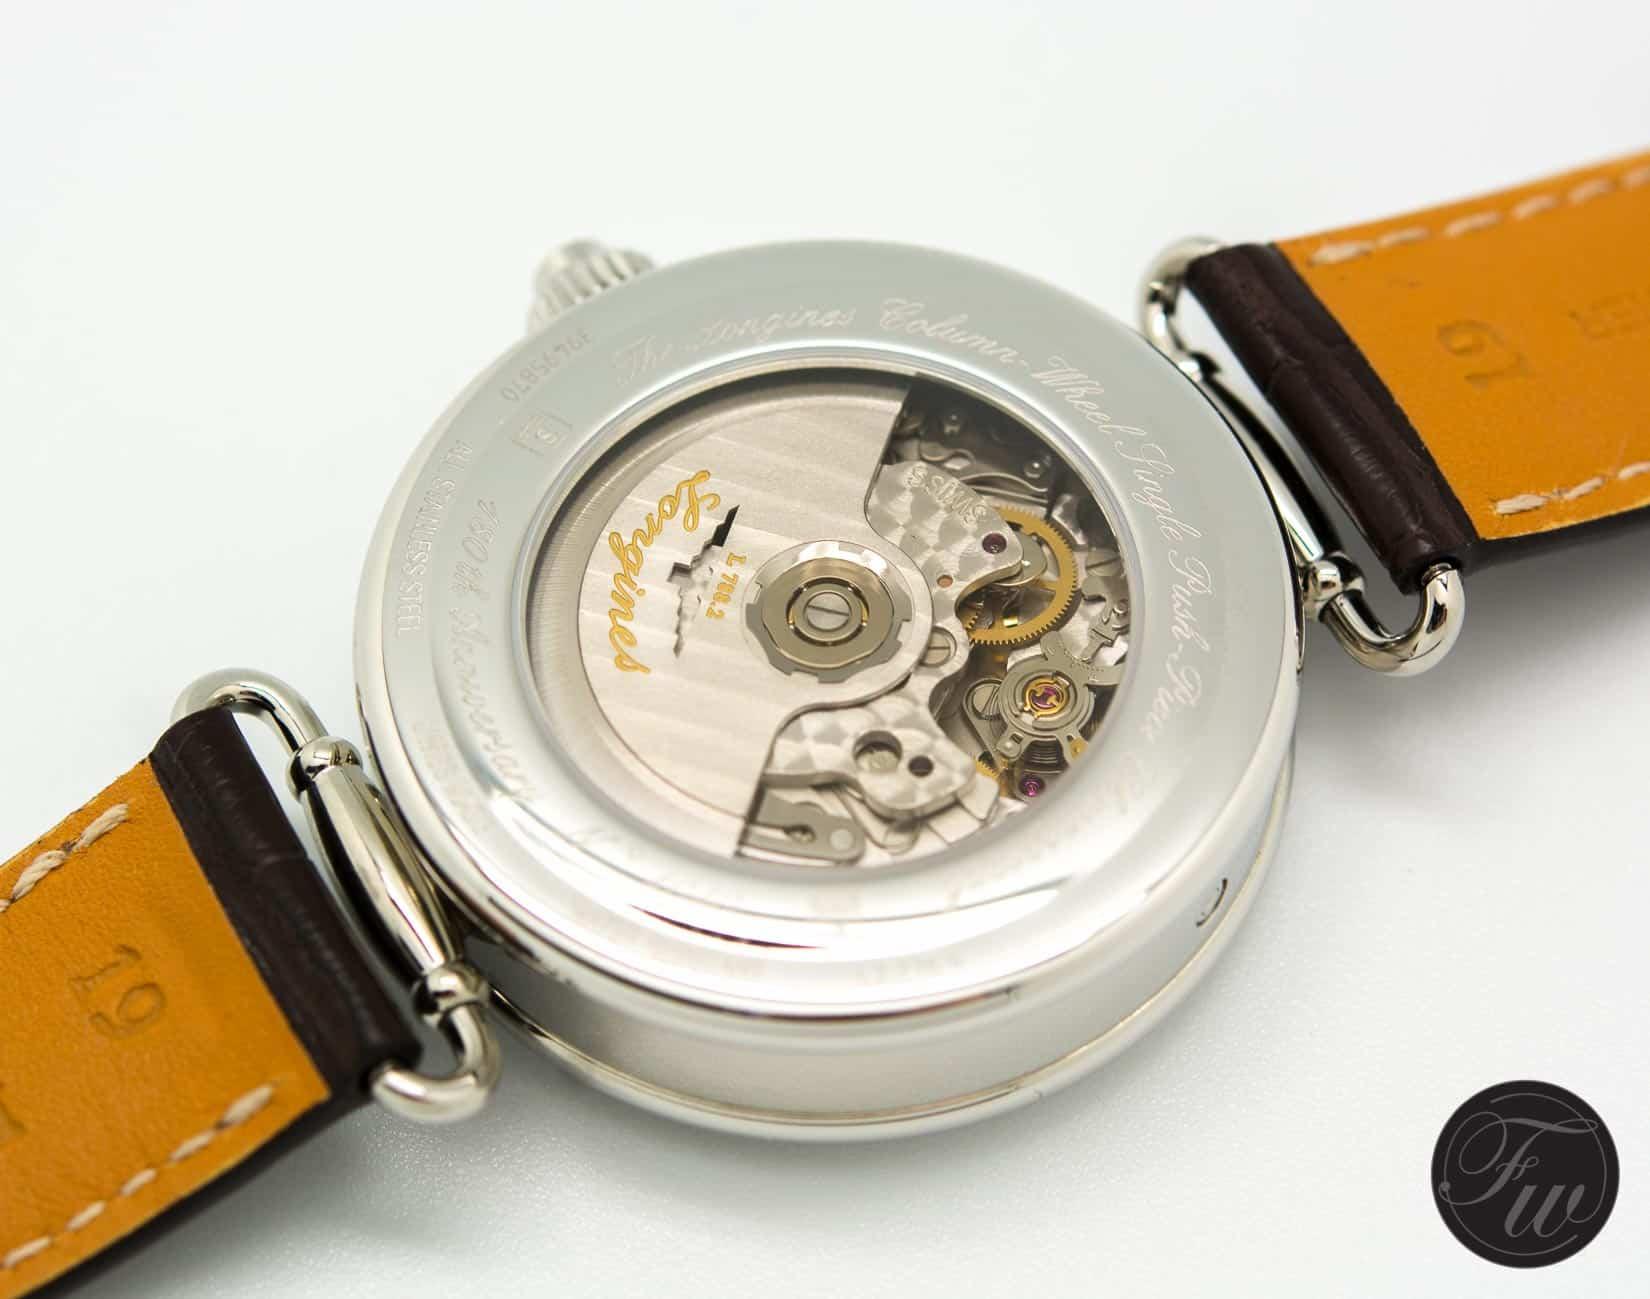 Longines Column-Wheel Single Push-Piece Chronograph